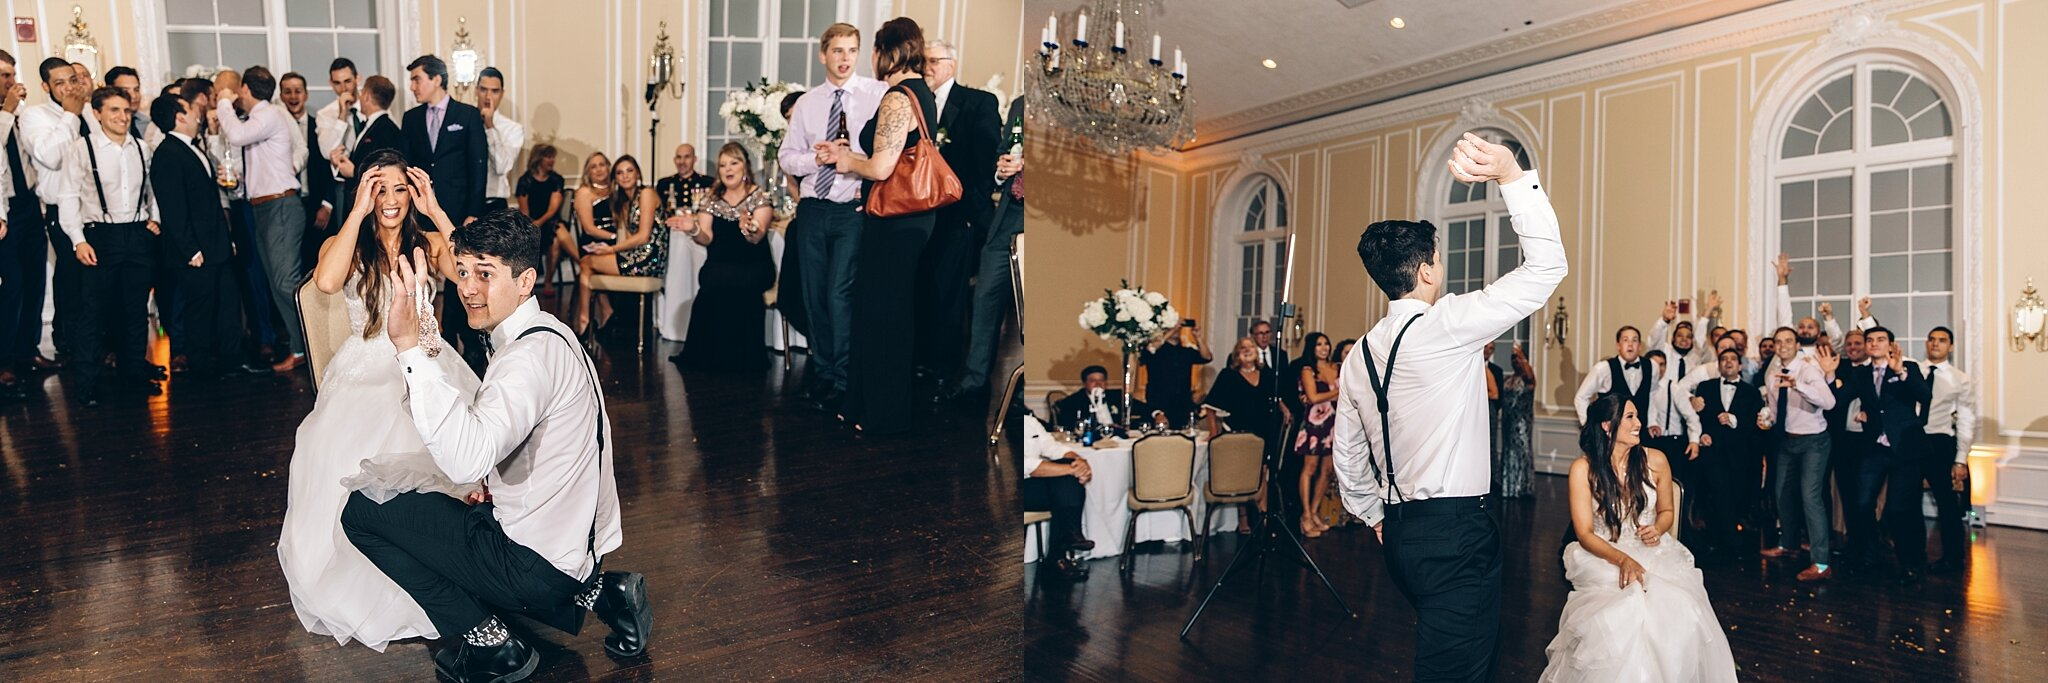 patrick-henry-ballroom-wedding-roanoke_0556.jpg